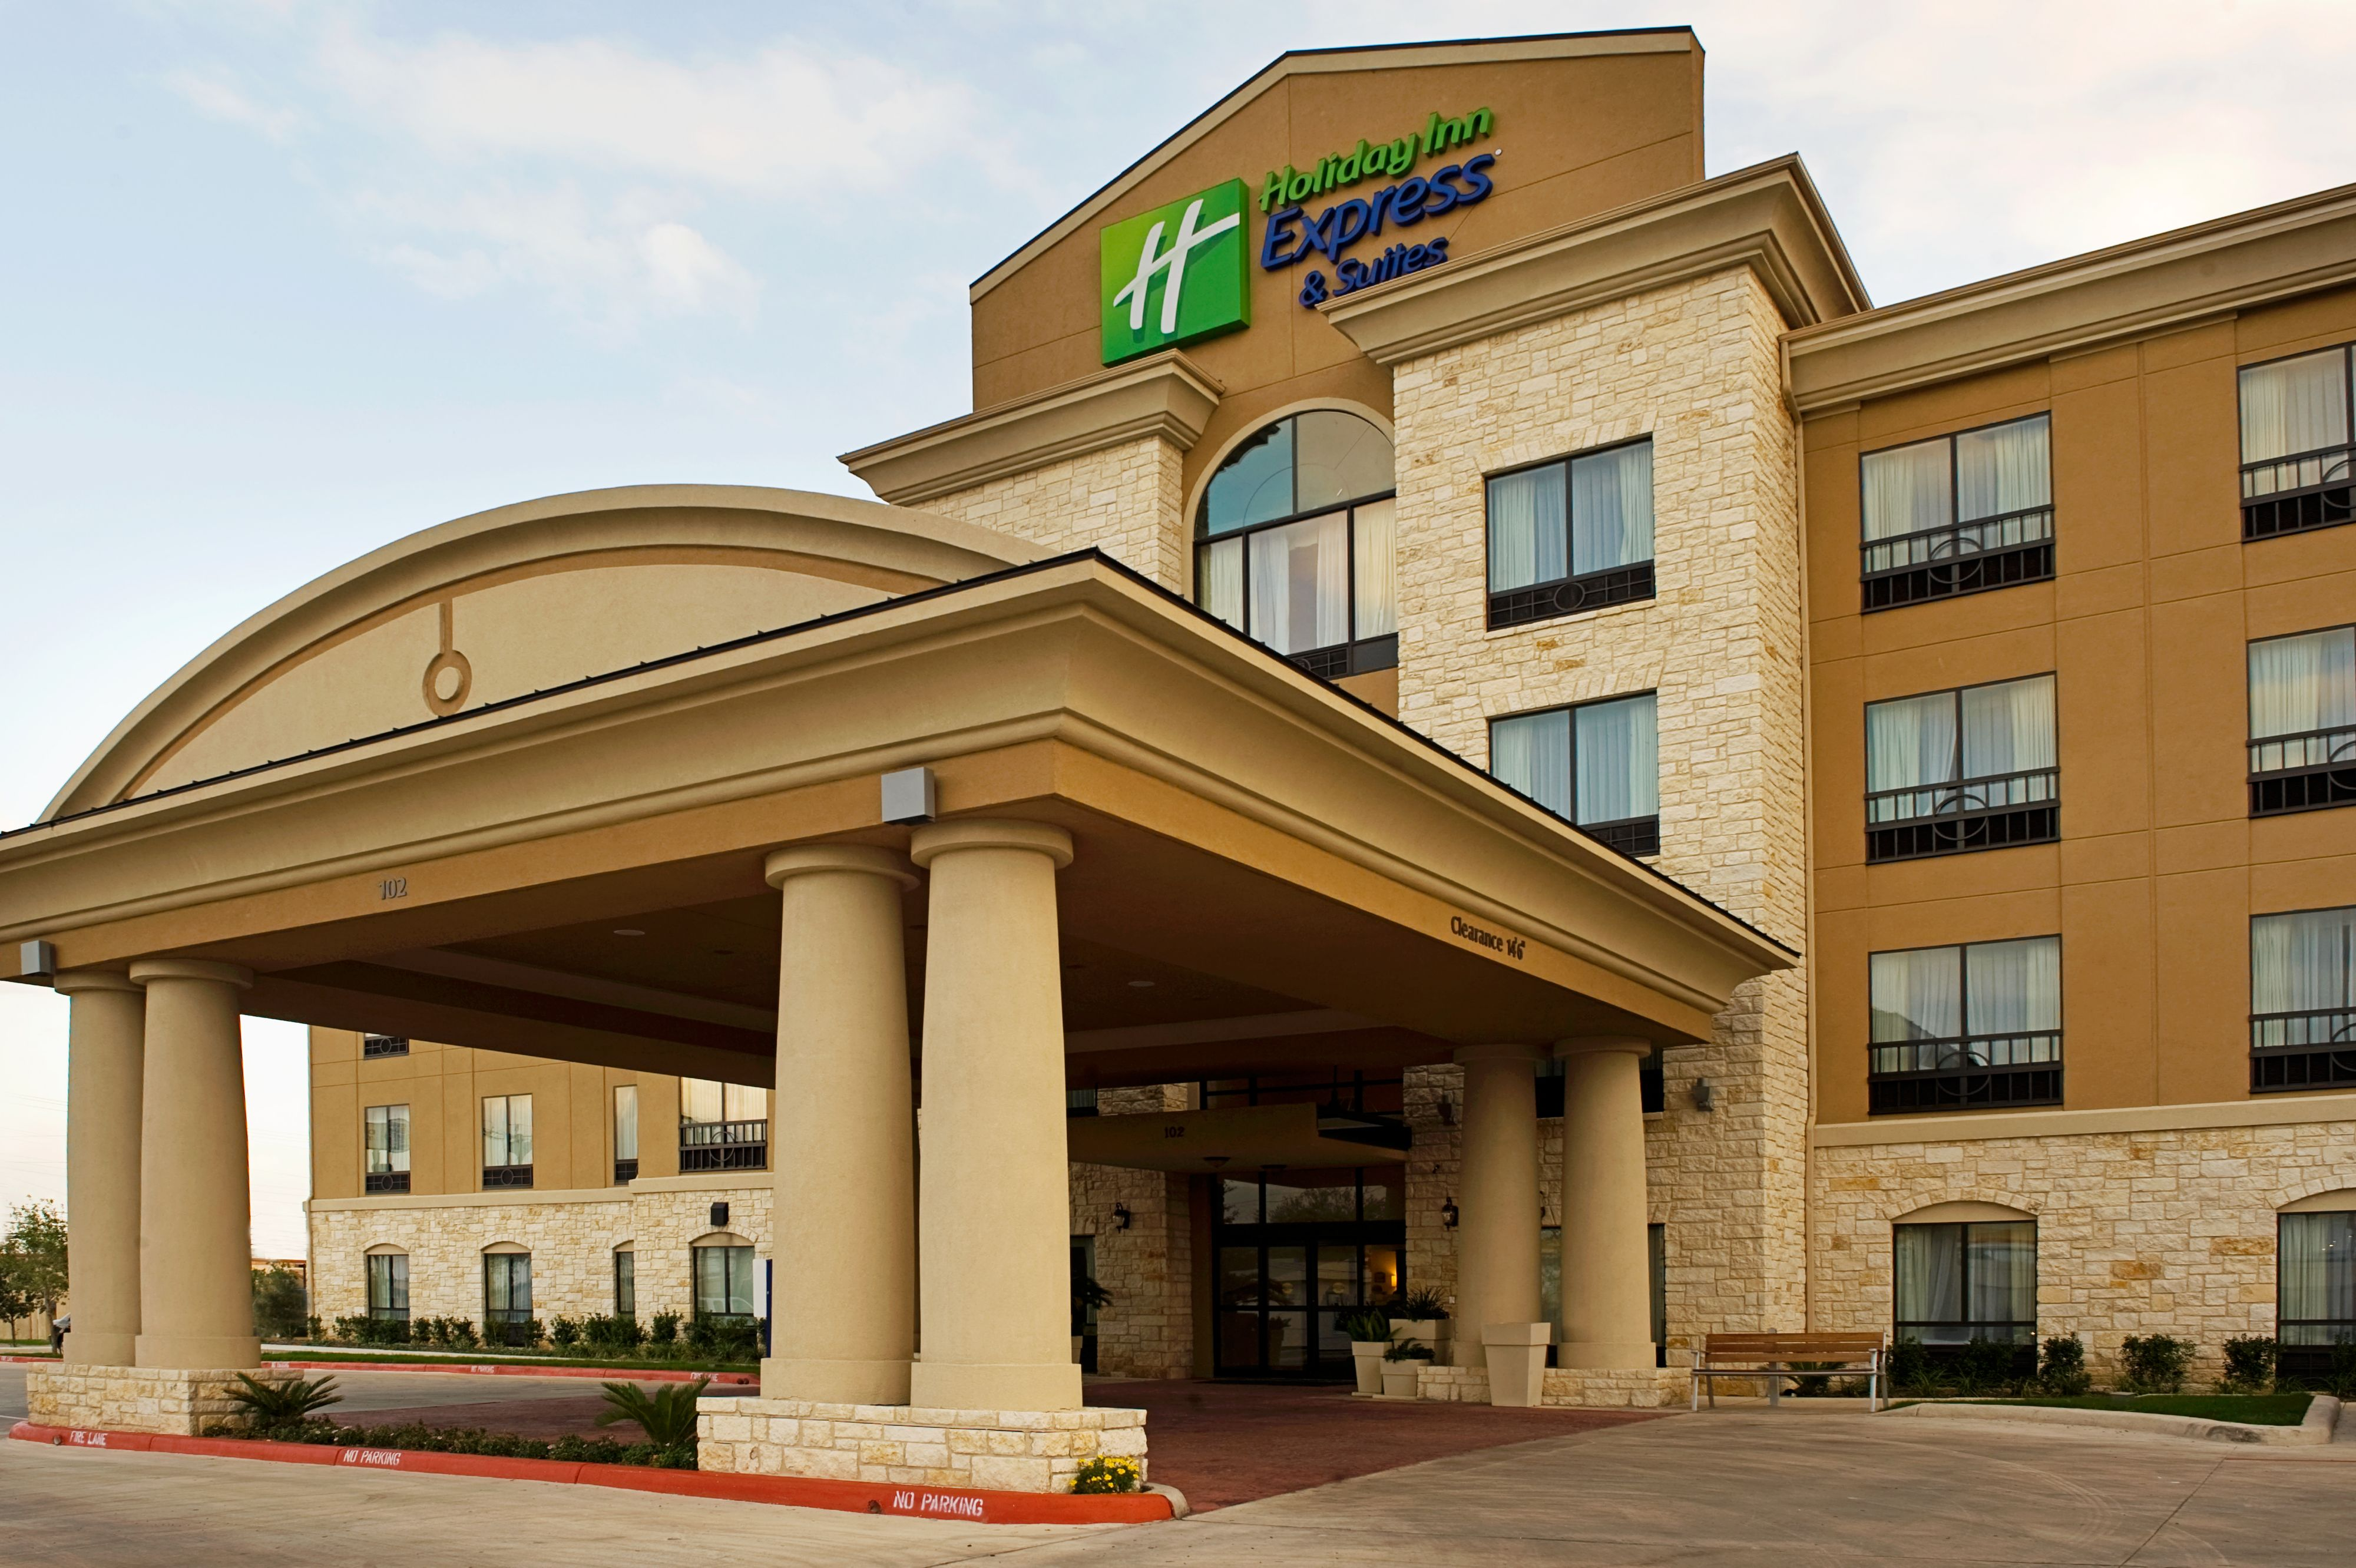 Holiday Inn Express San Antonio N